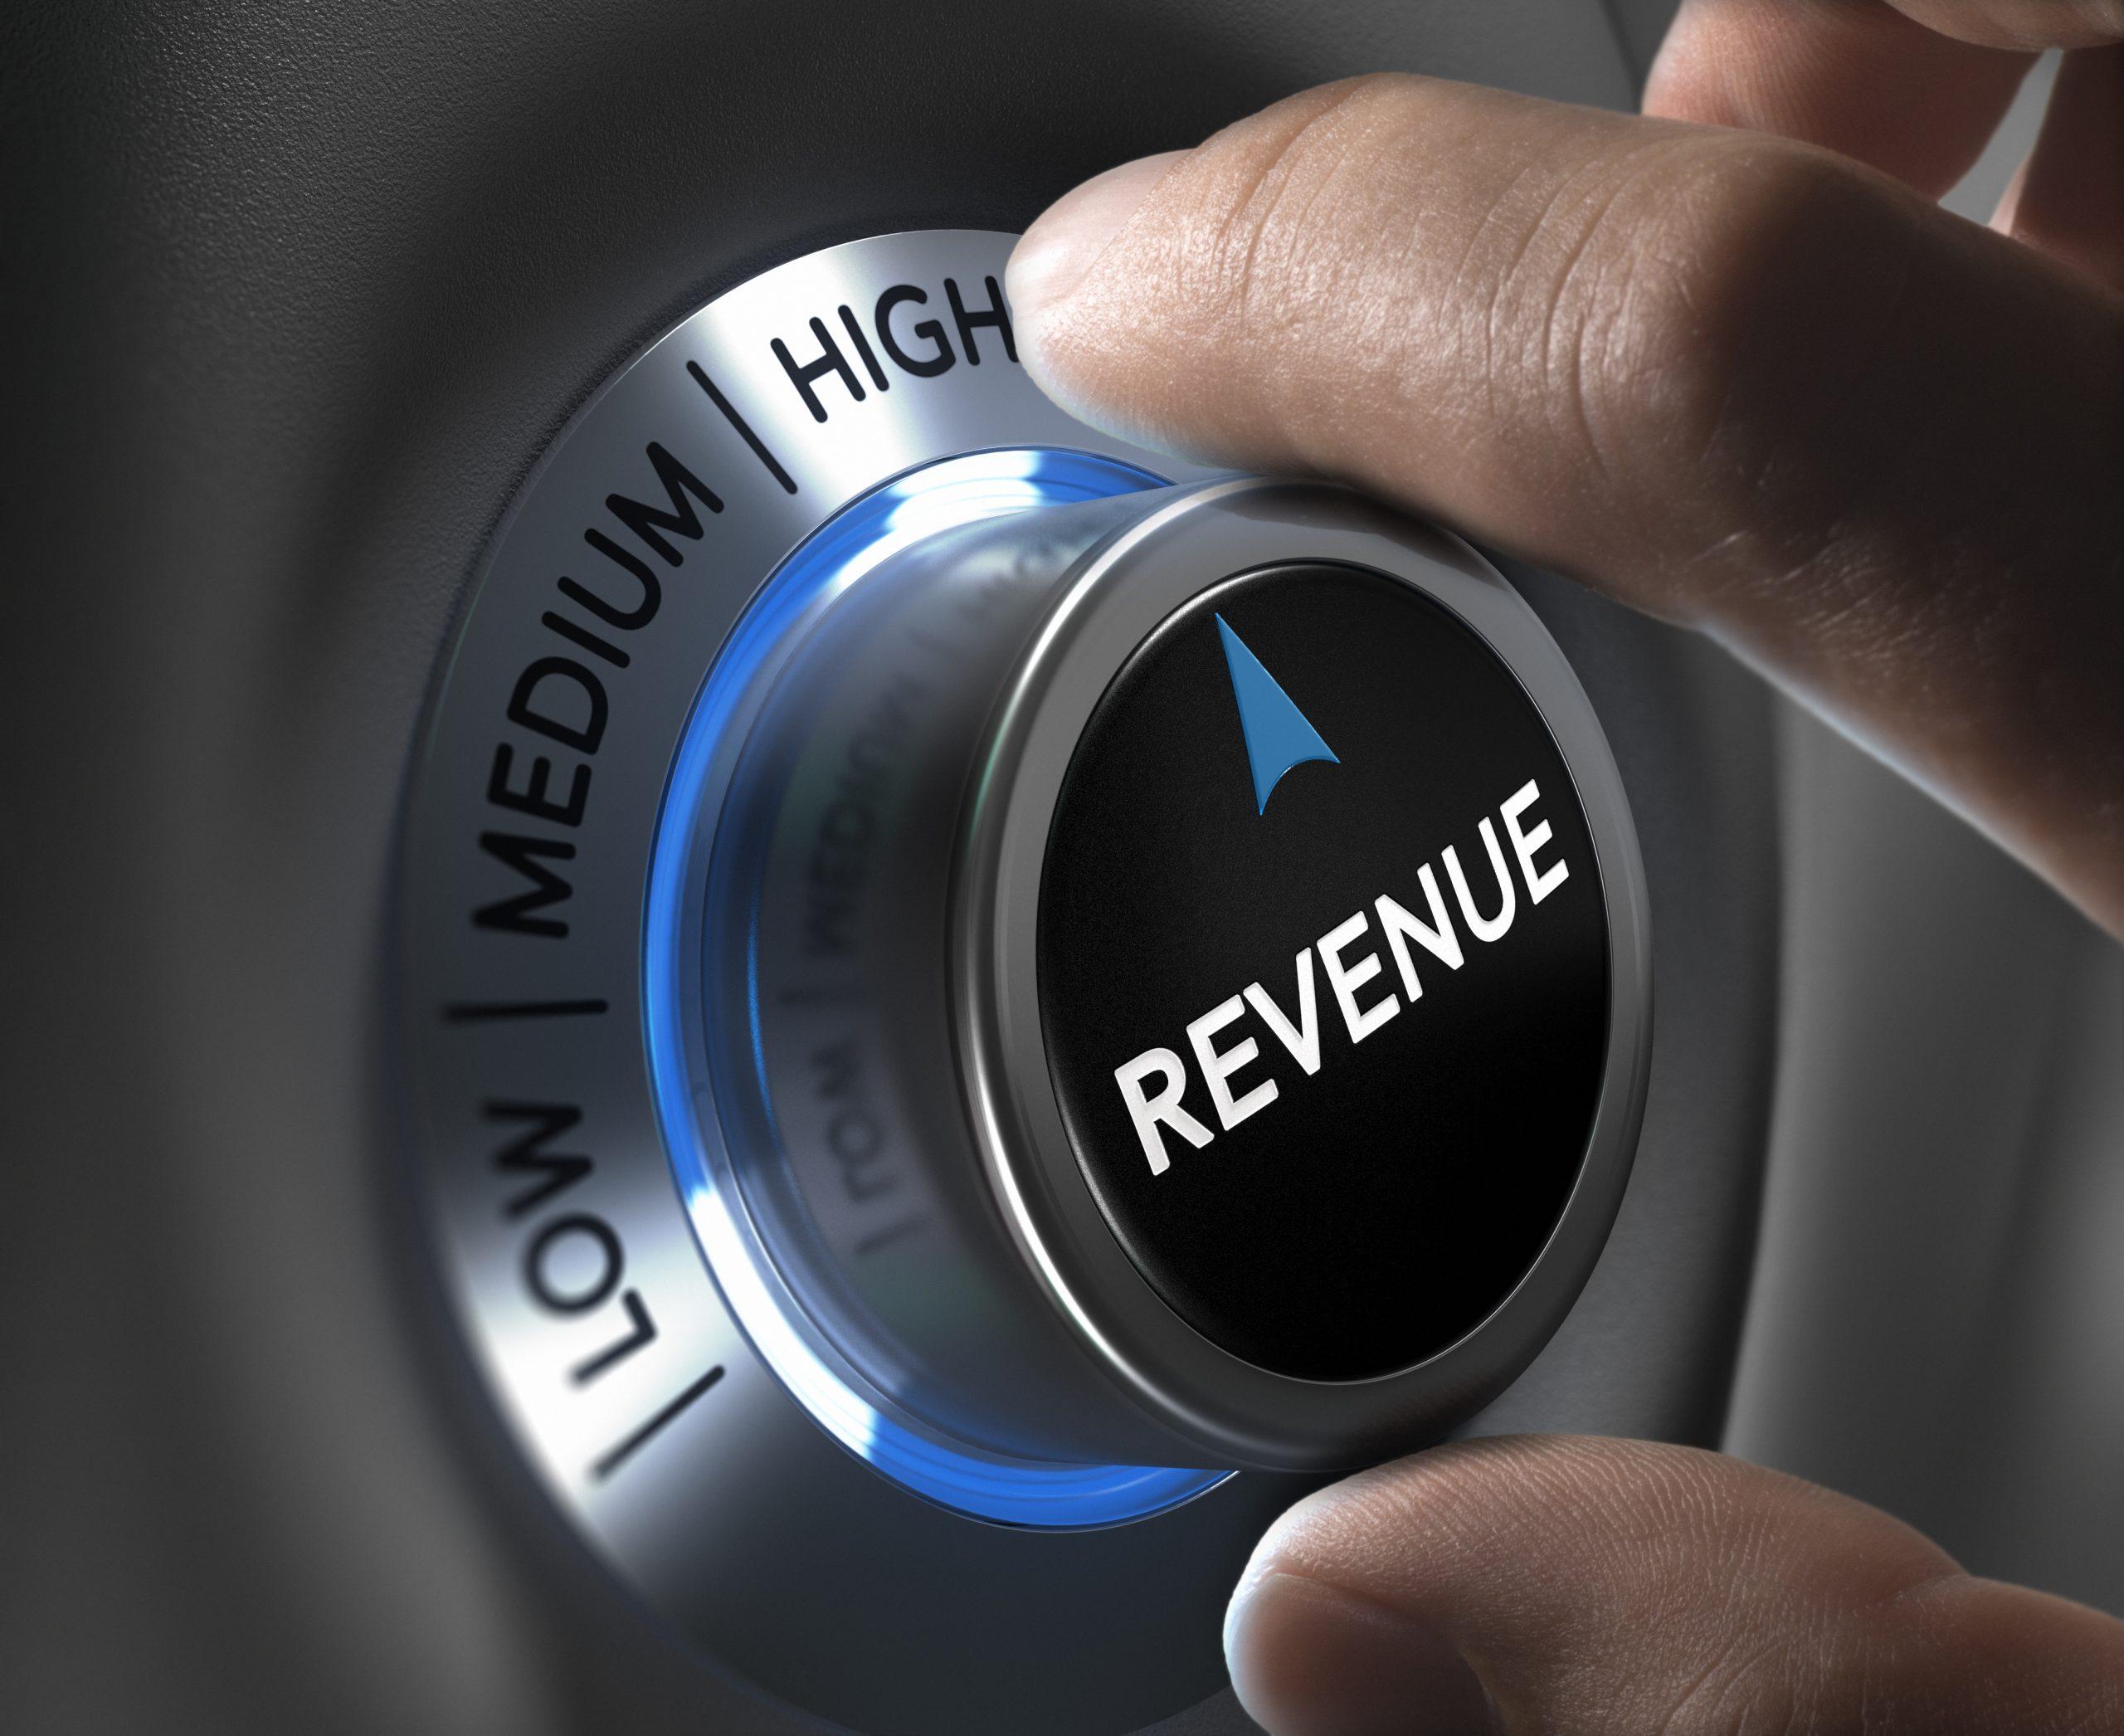 https://depositphotos.com/48303873/stock-photo-increase-sales-revenue.html